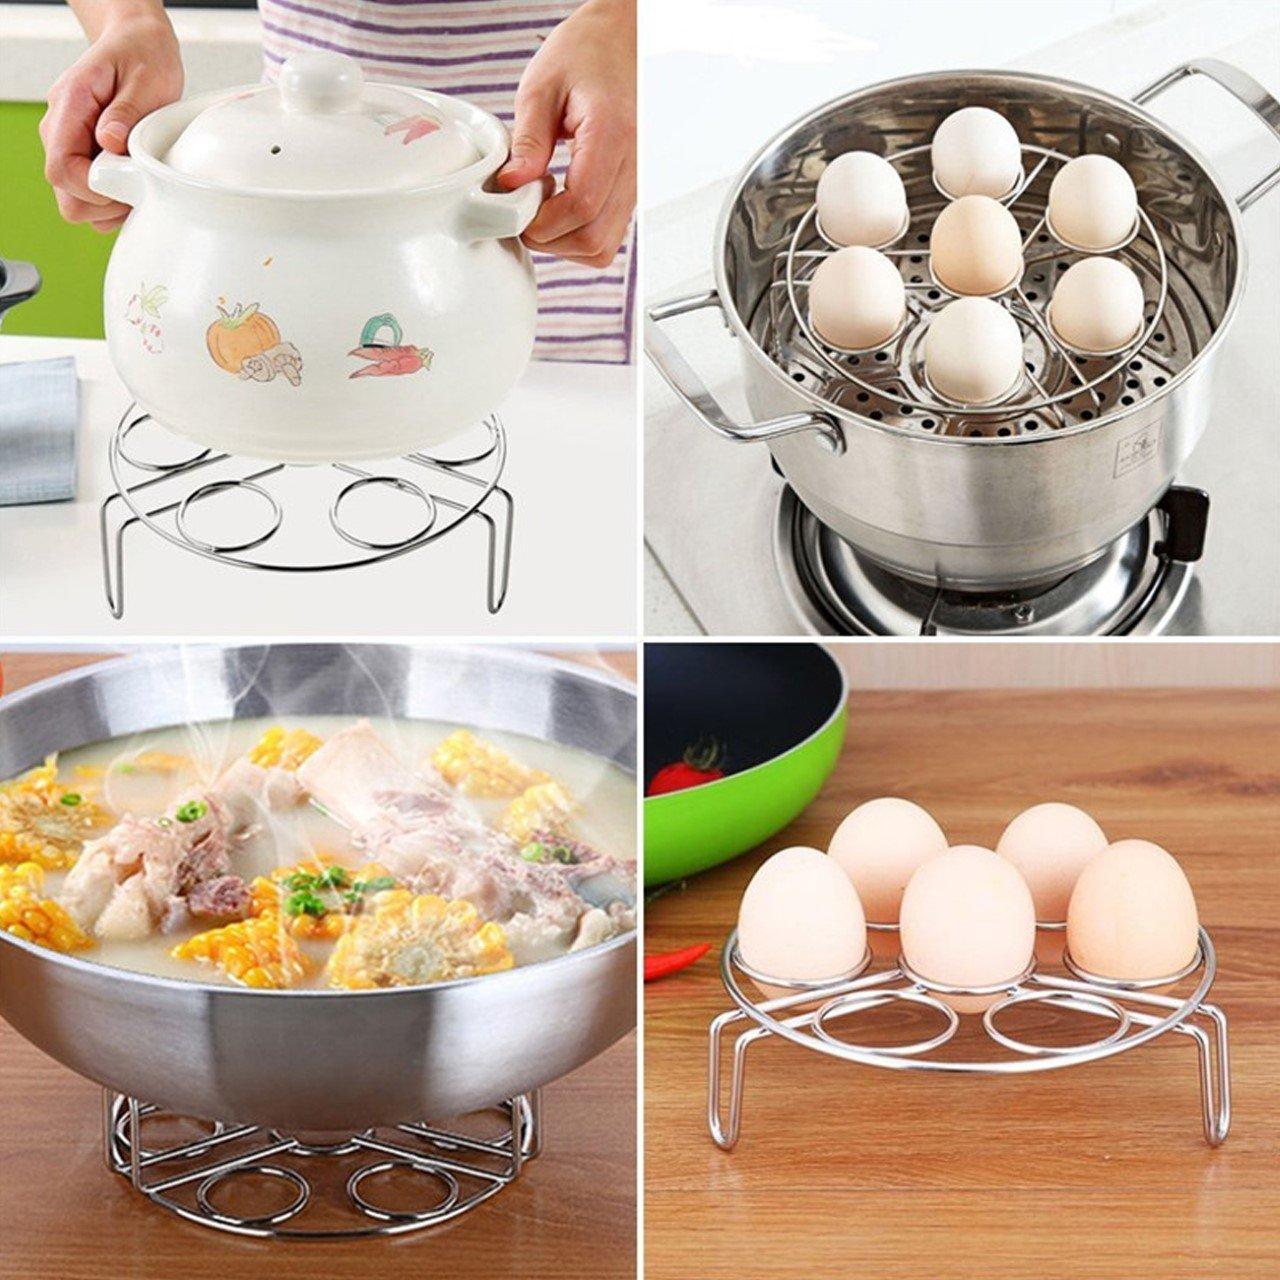 TinaWood 2 PCS//Set Curved and Straight Egg Cooker Stand//Stackable Steamer Rack for Instant Pot//Vegetable Steam Rack Trivet Basket for Pressure Cooker Curved+Straight